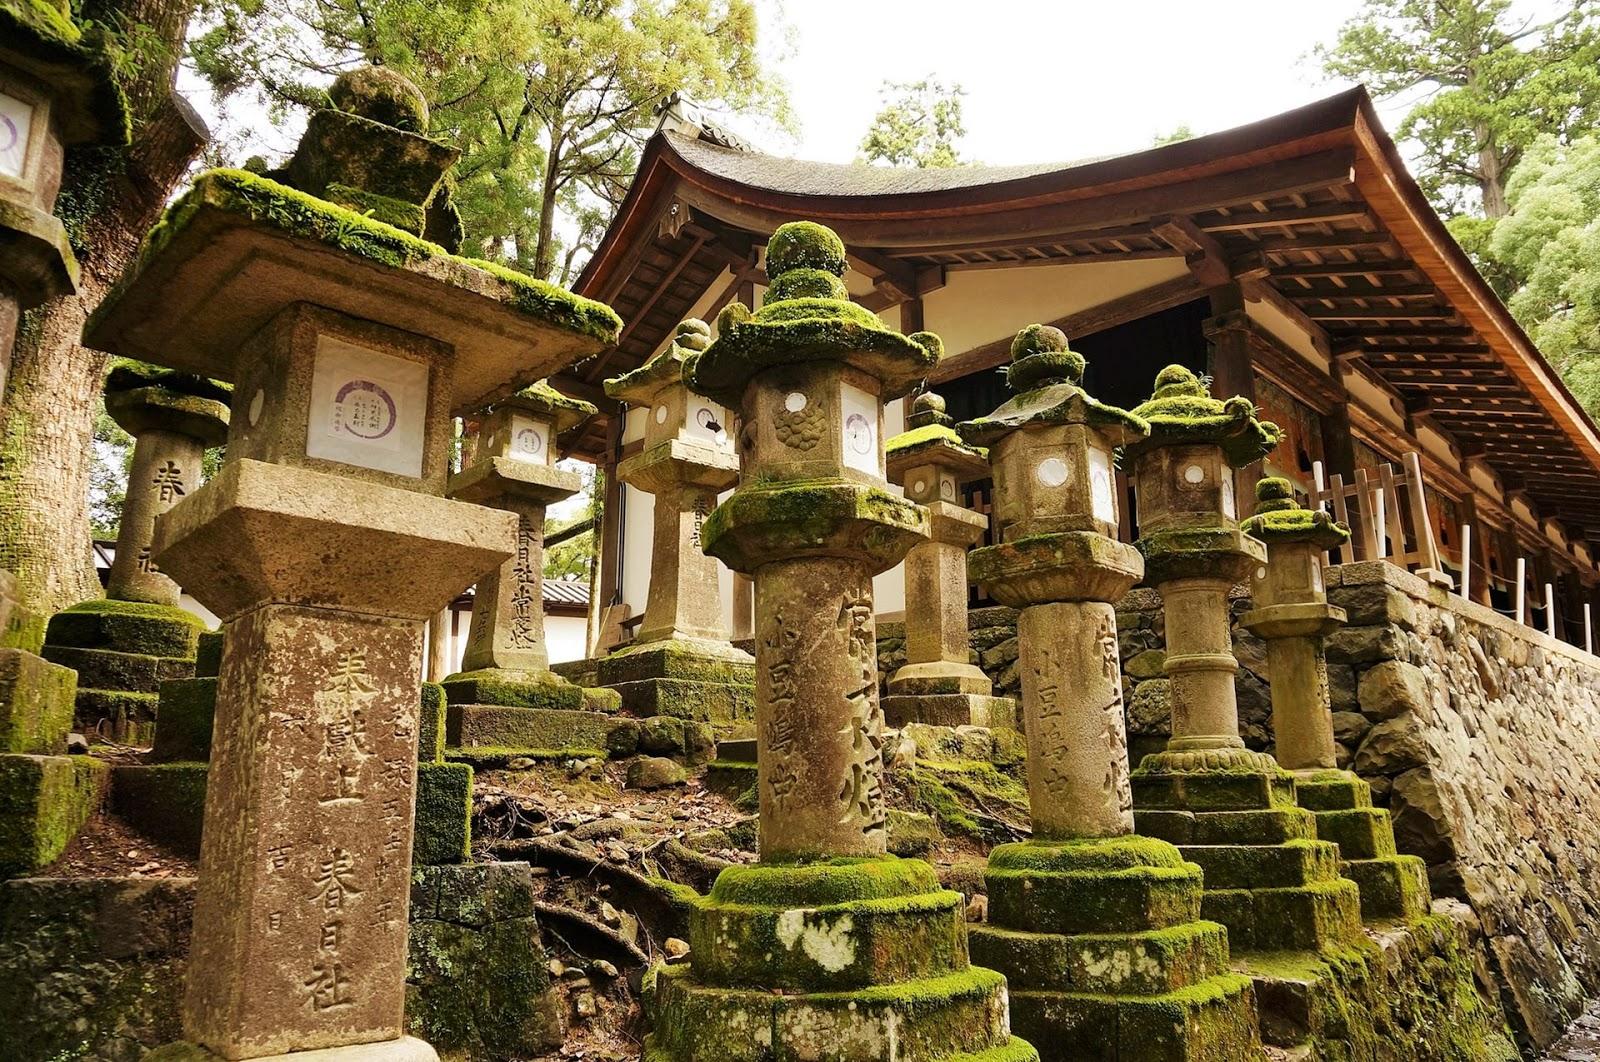 奈良-景點-推薦-市區-自由行-必玩-必遊-旅遊-觀光-日本-Nara-Tourist-Attraction